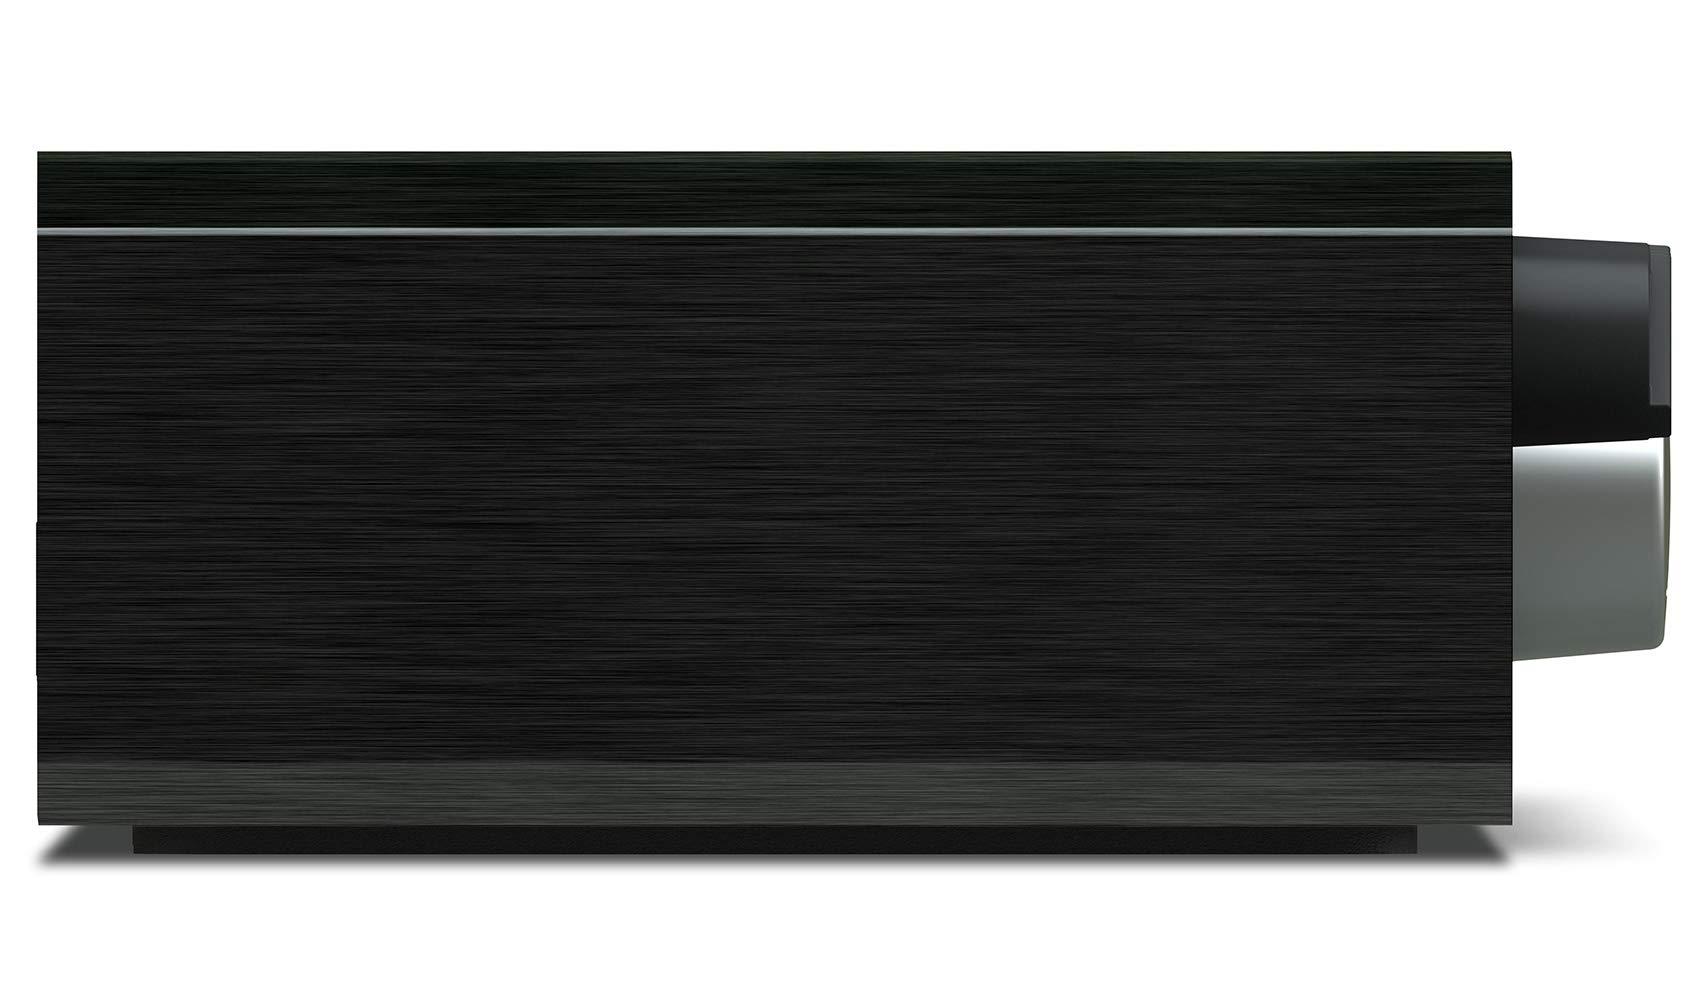 Mackie Onyx Producer 2.2 2x2 USB Audio MIDI Recording Studio Interface + Stand by Mackie (Image #5)